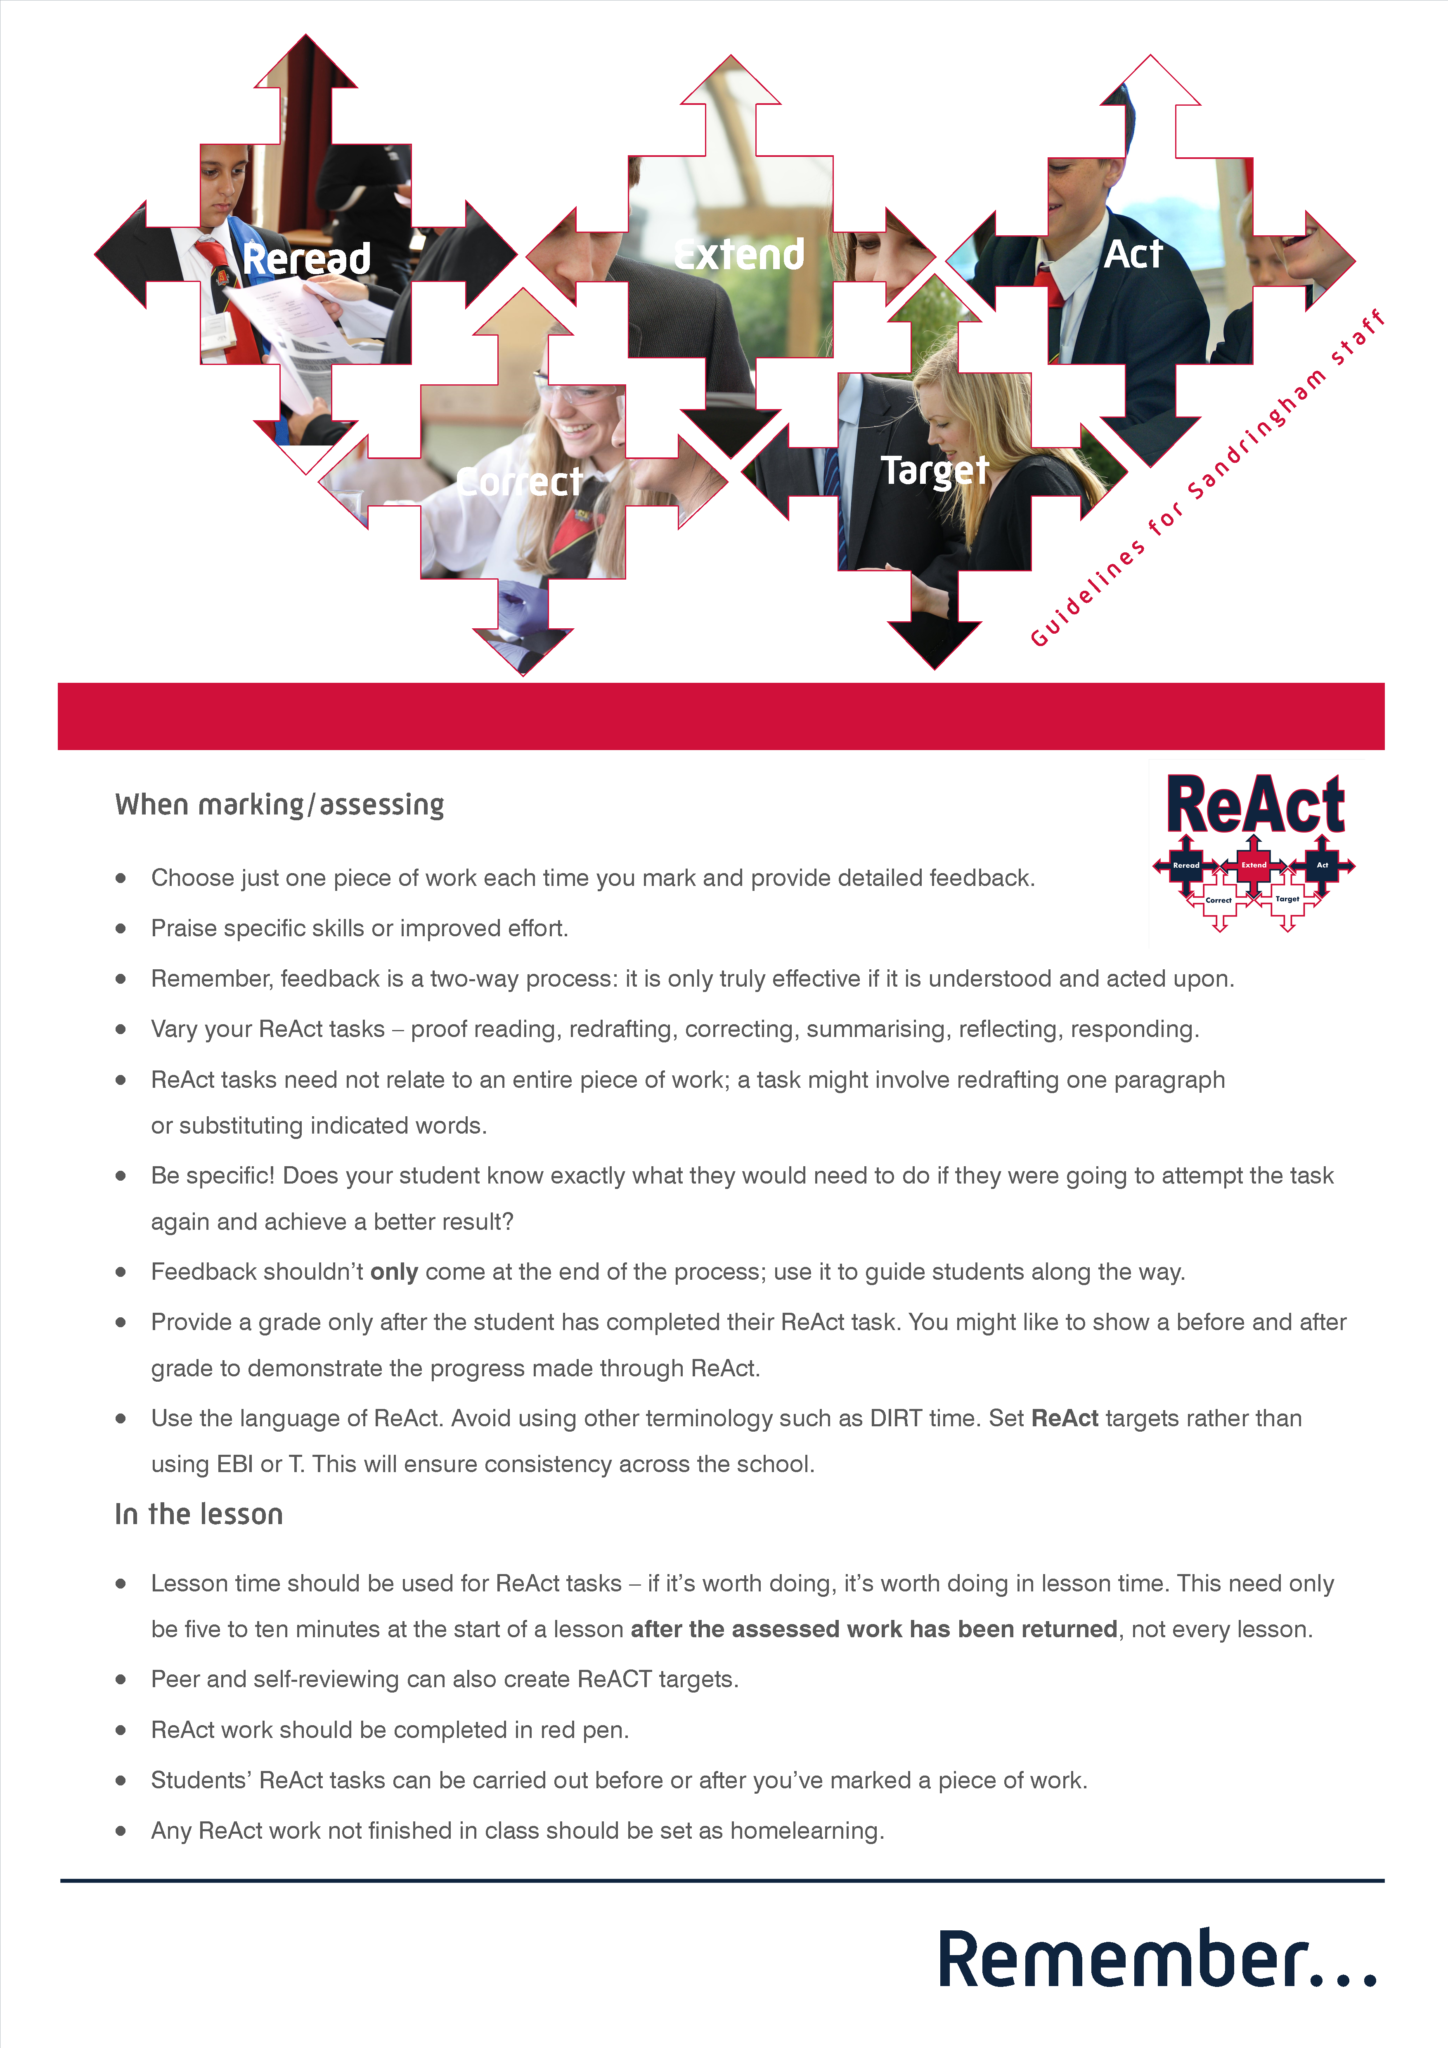 ReAct staff planner